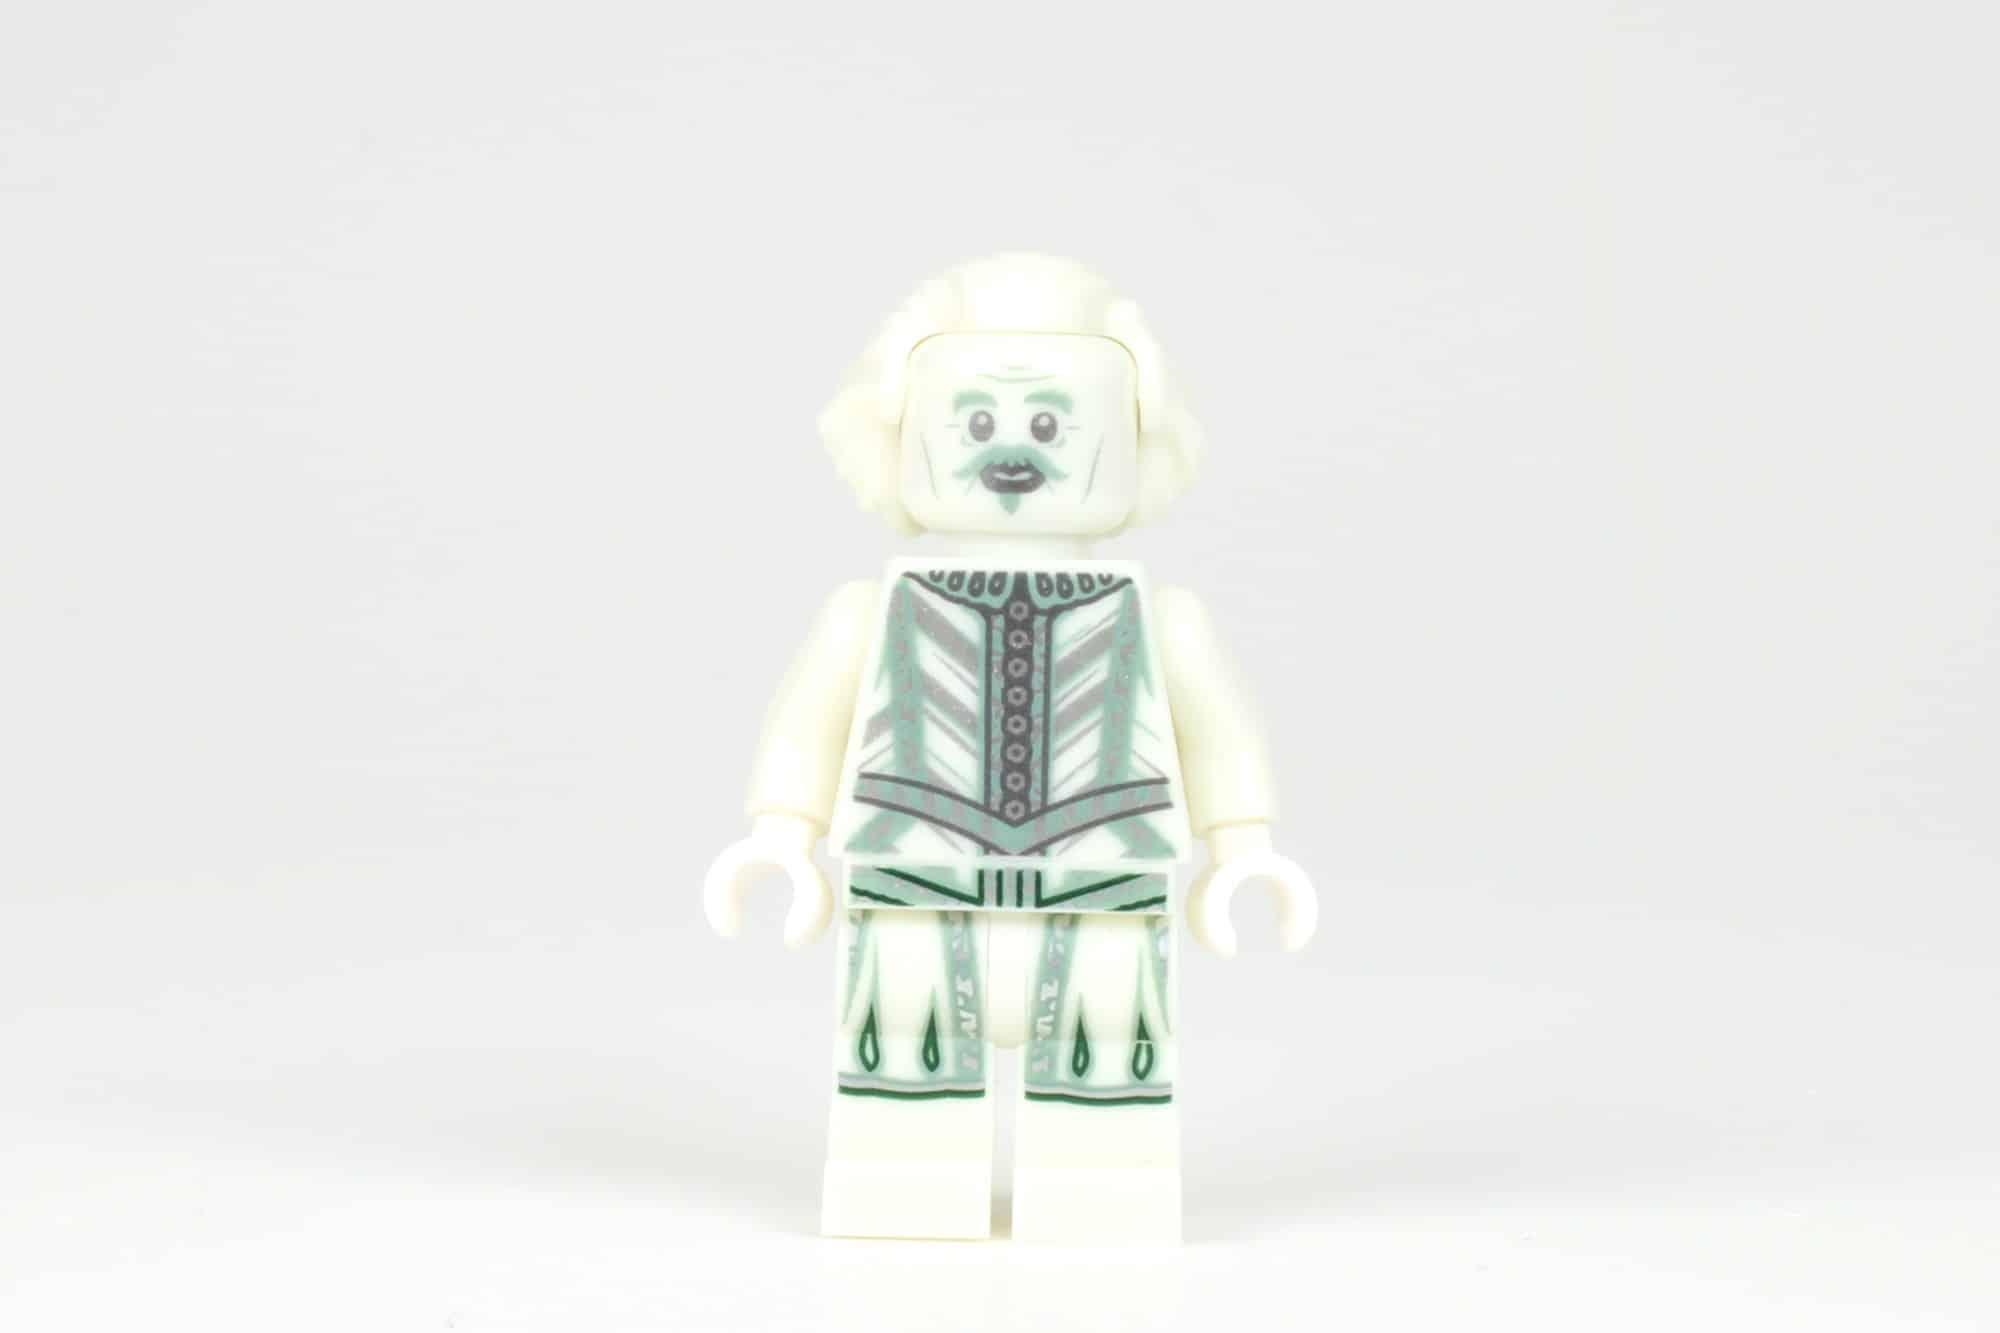 LEGO Harry Potter 76389 Hogwarts Kammer Des Schreckens Minifiguren 4 1